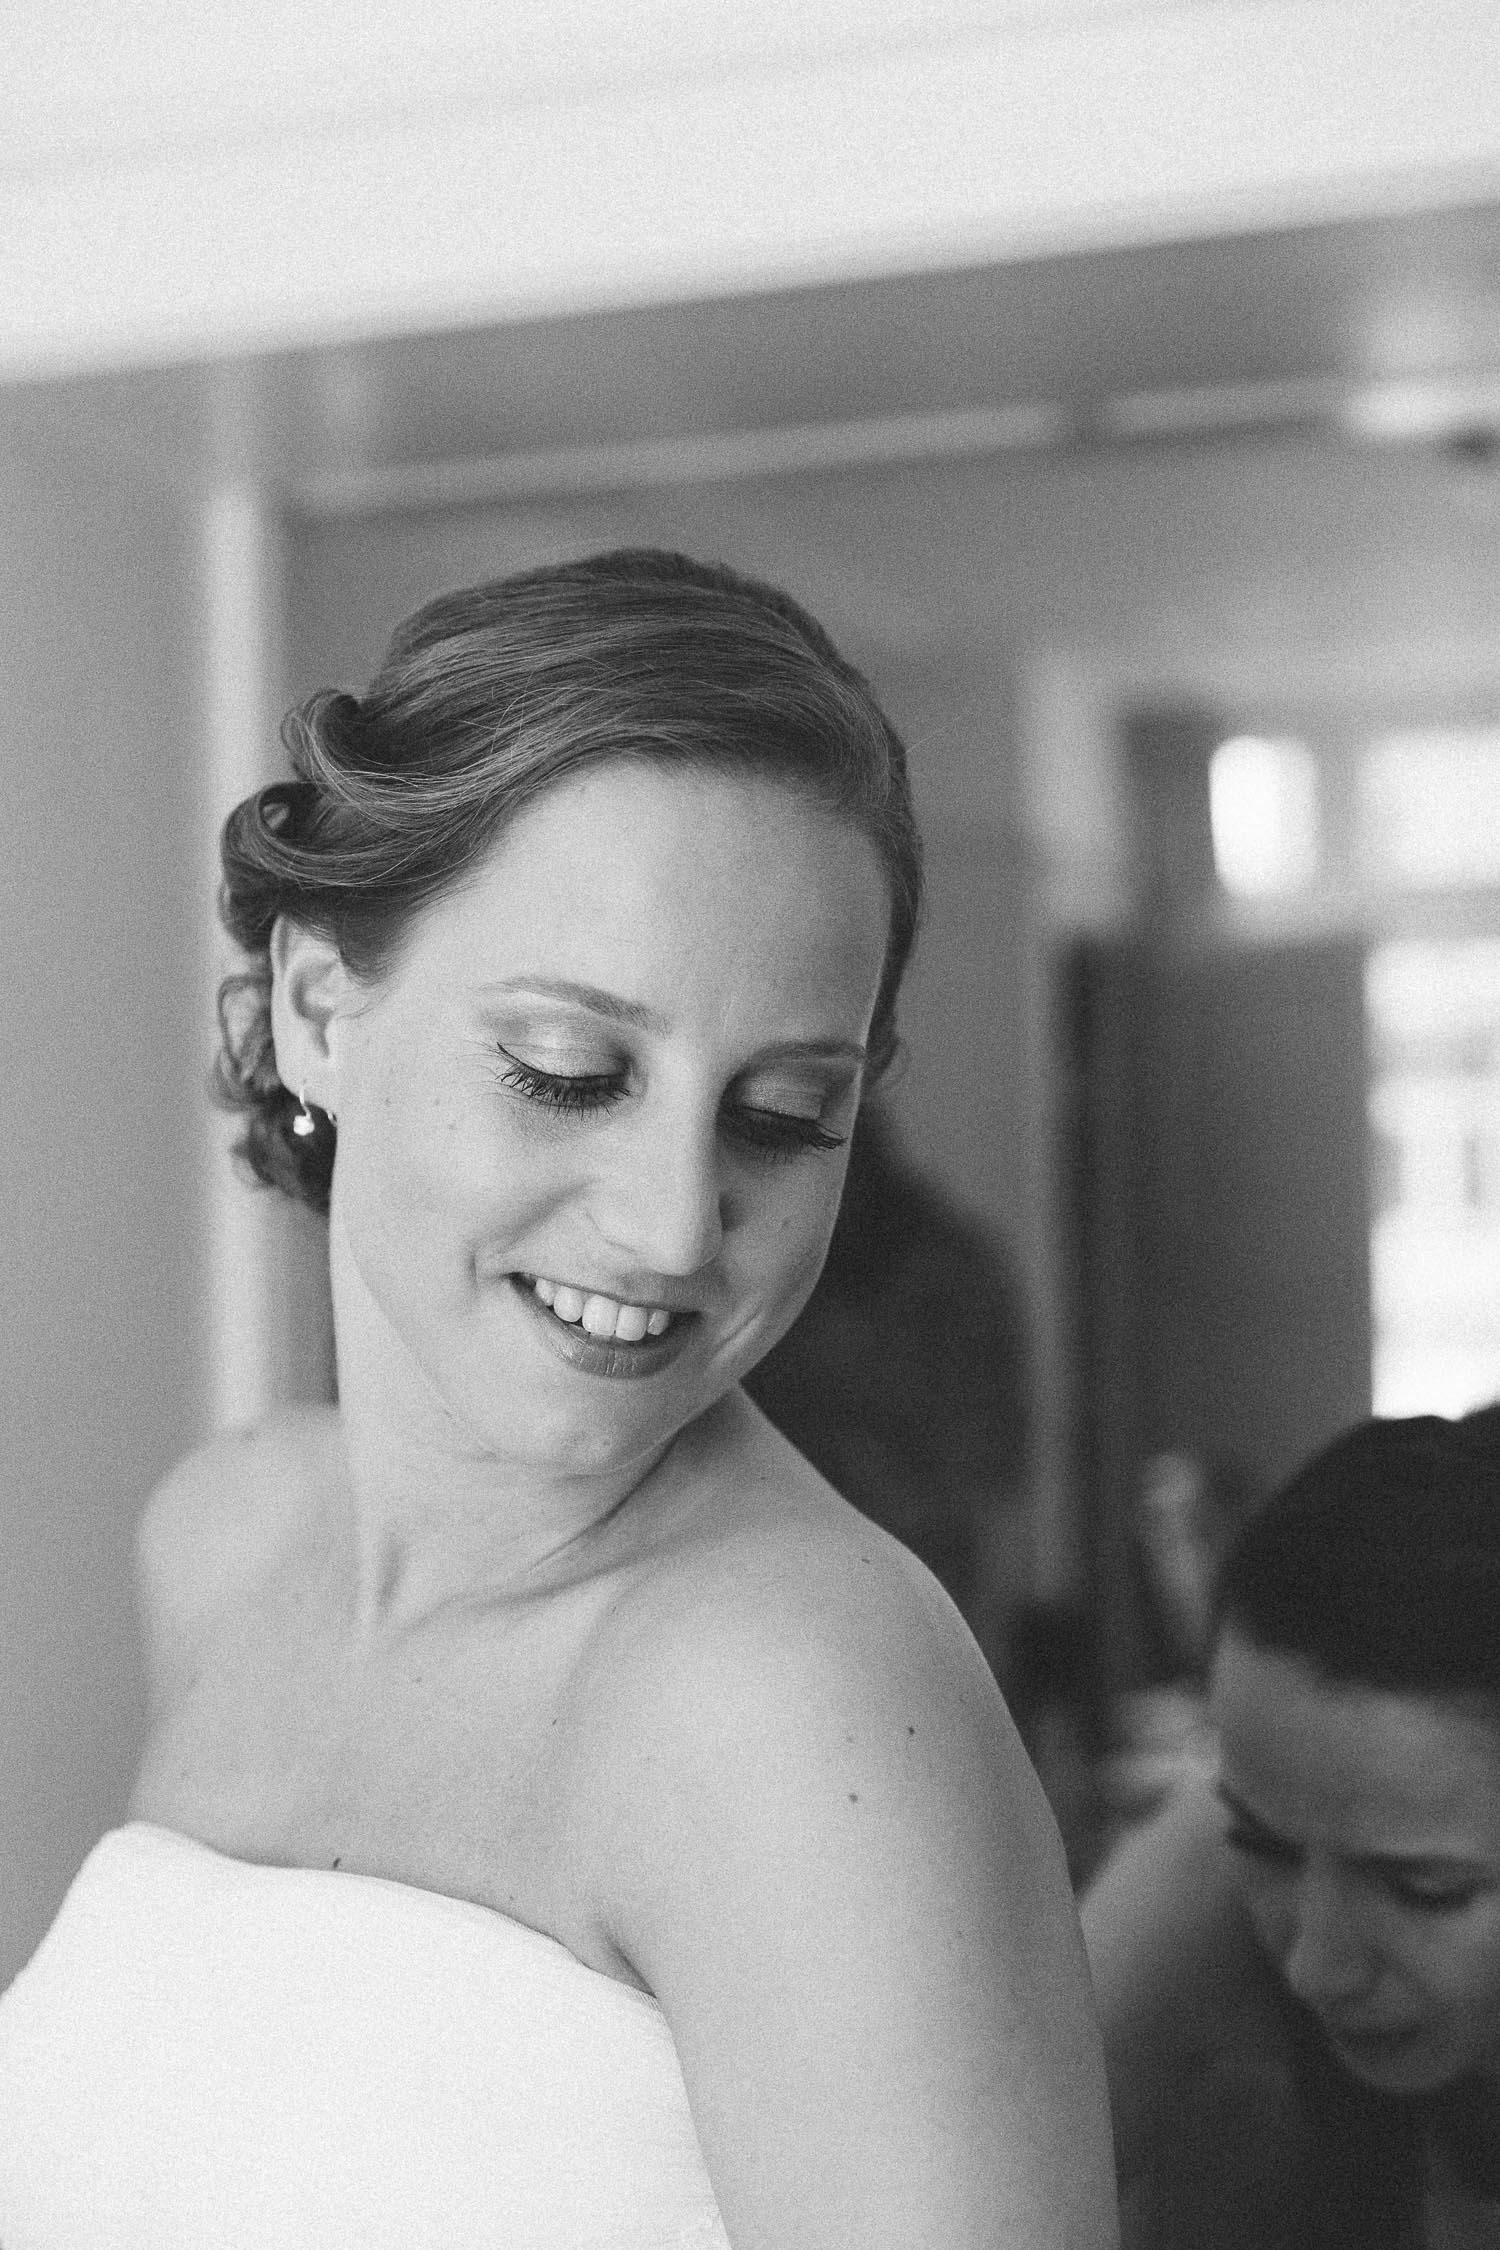 Wedding-huwelijk-trouwen-bruiloft-photography-fotografie-fotograaf-photographer-Rijksmuseum-College-Hotel-On-a-hazy-morning-Amsterdam-The-Netherlands-57.jpg